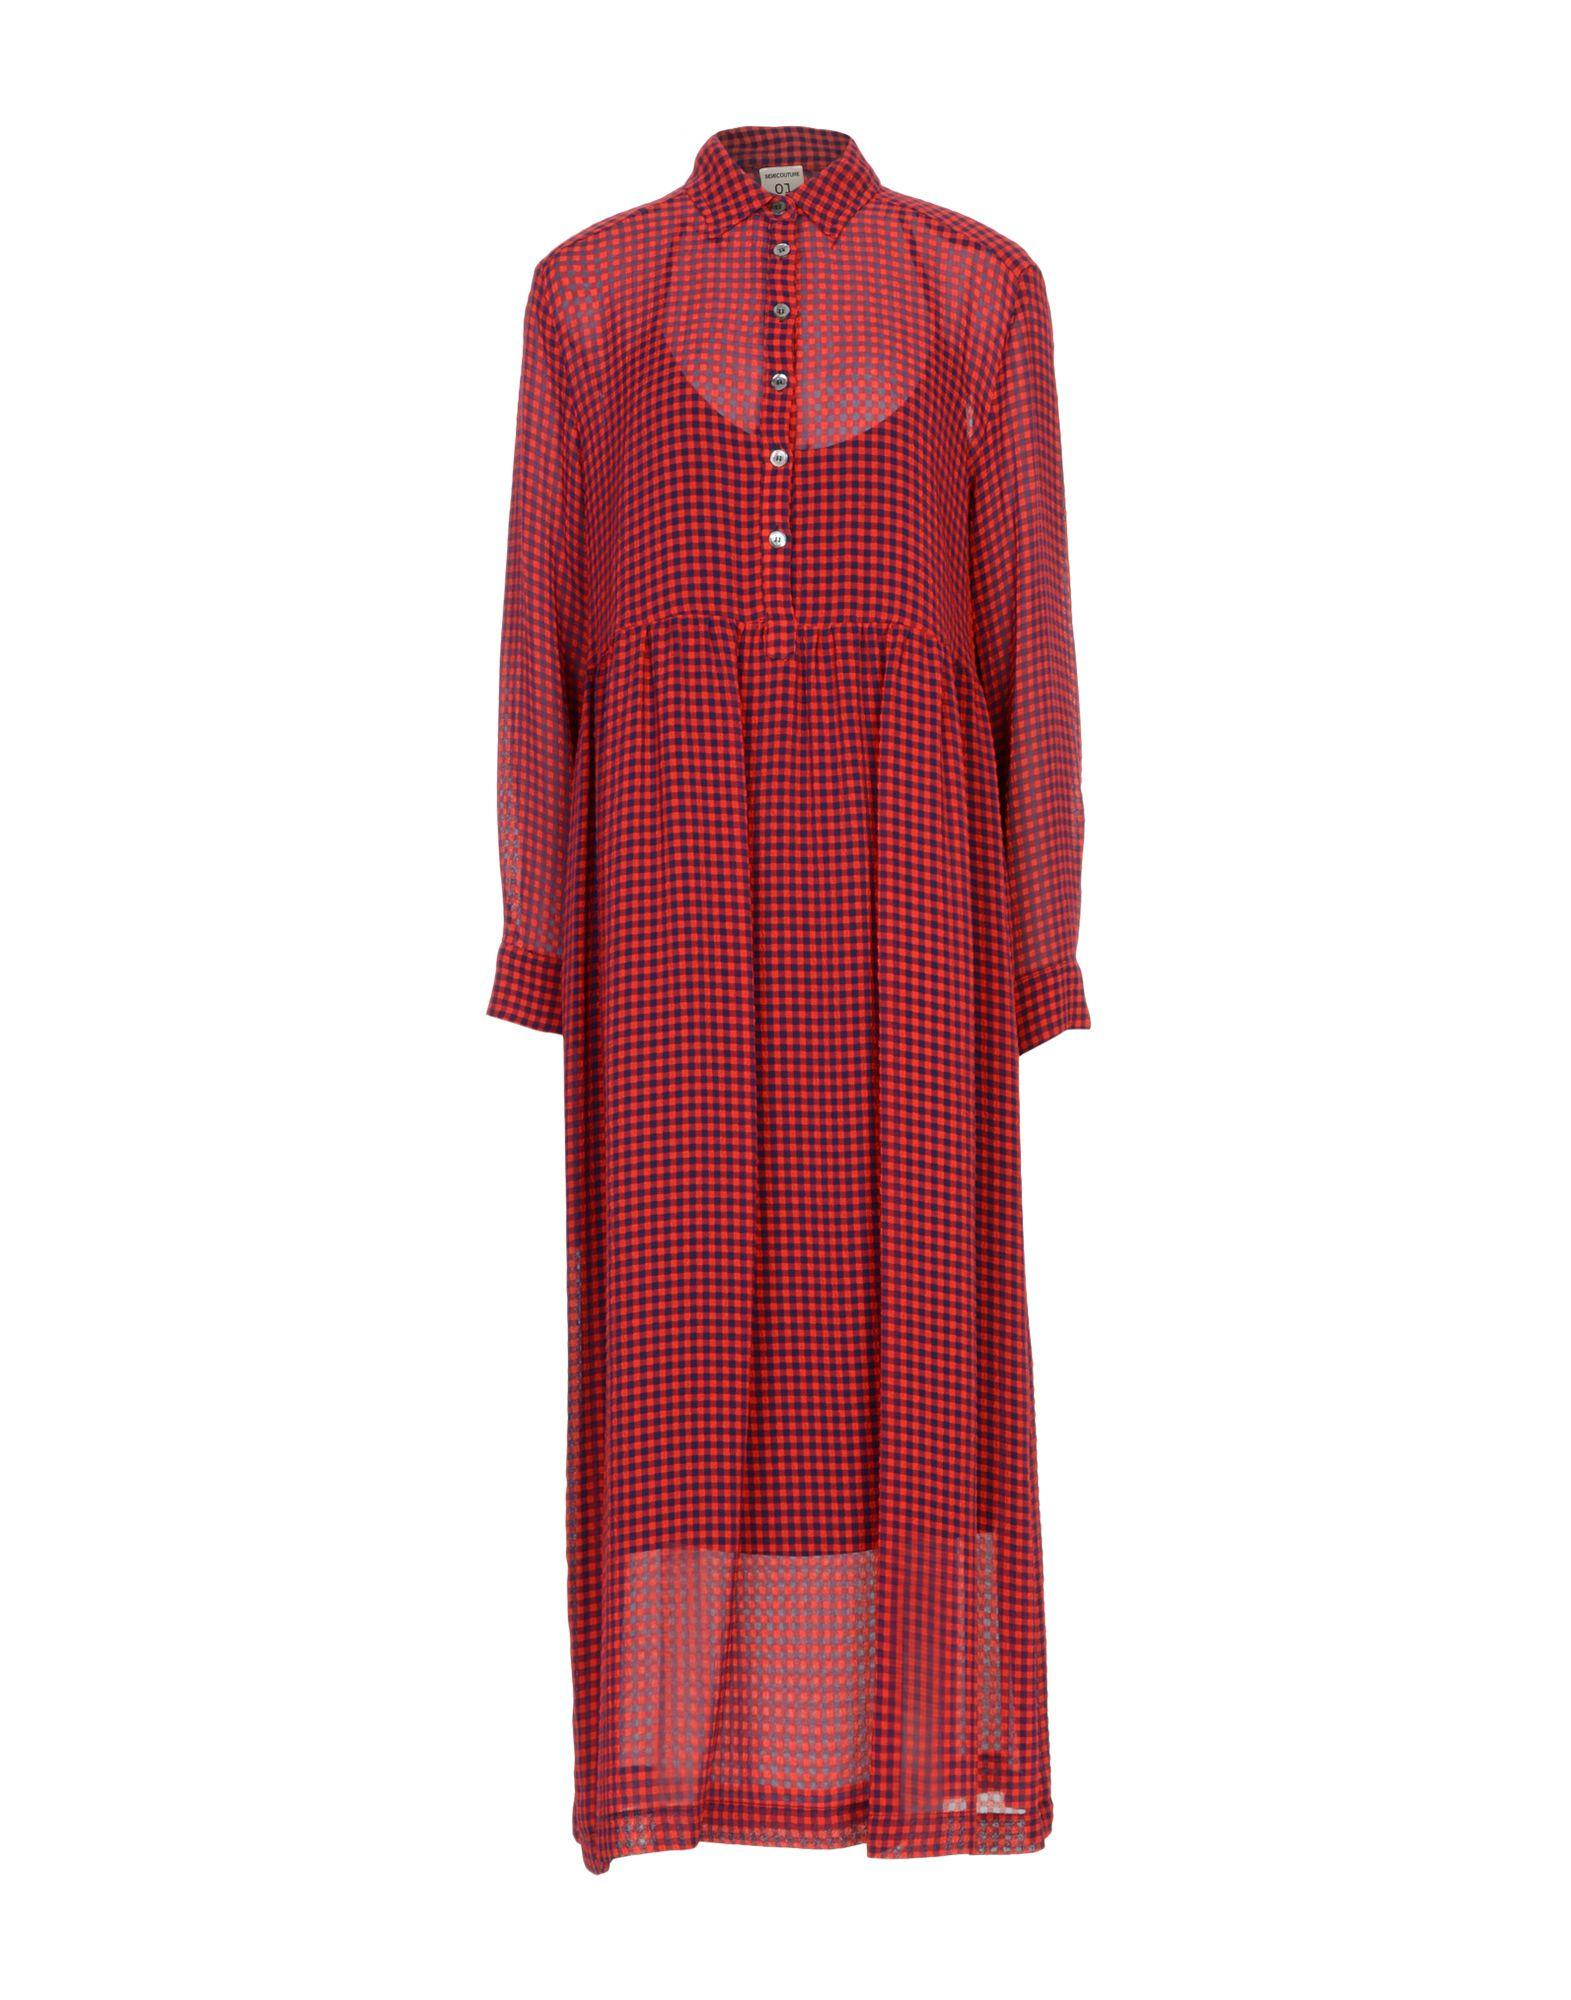 Semicouture Midi Dress In Red